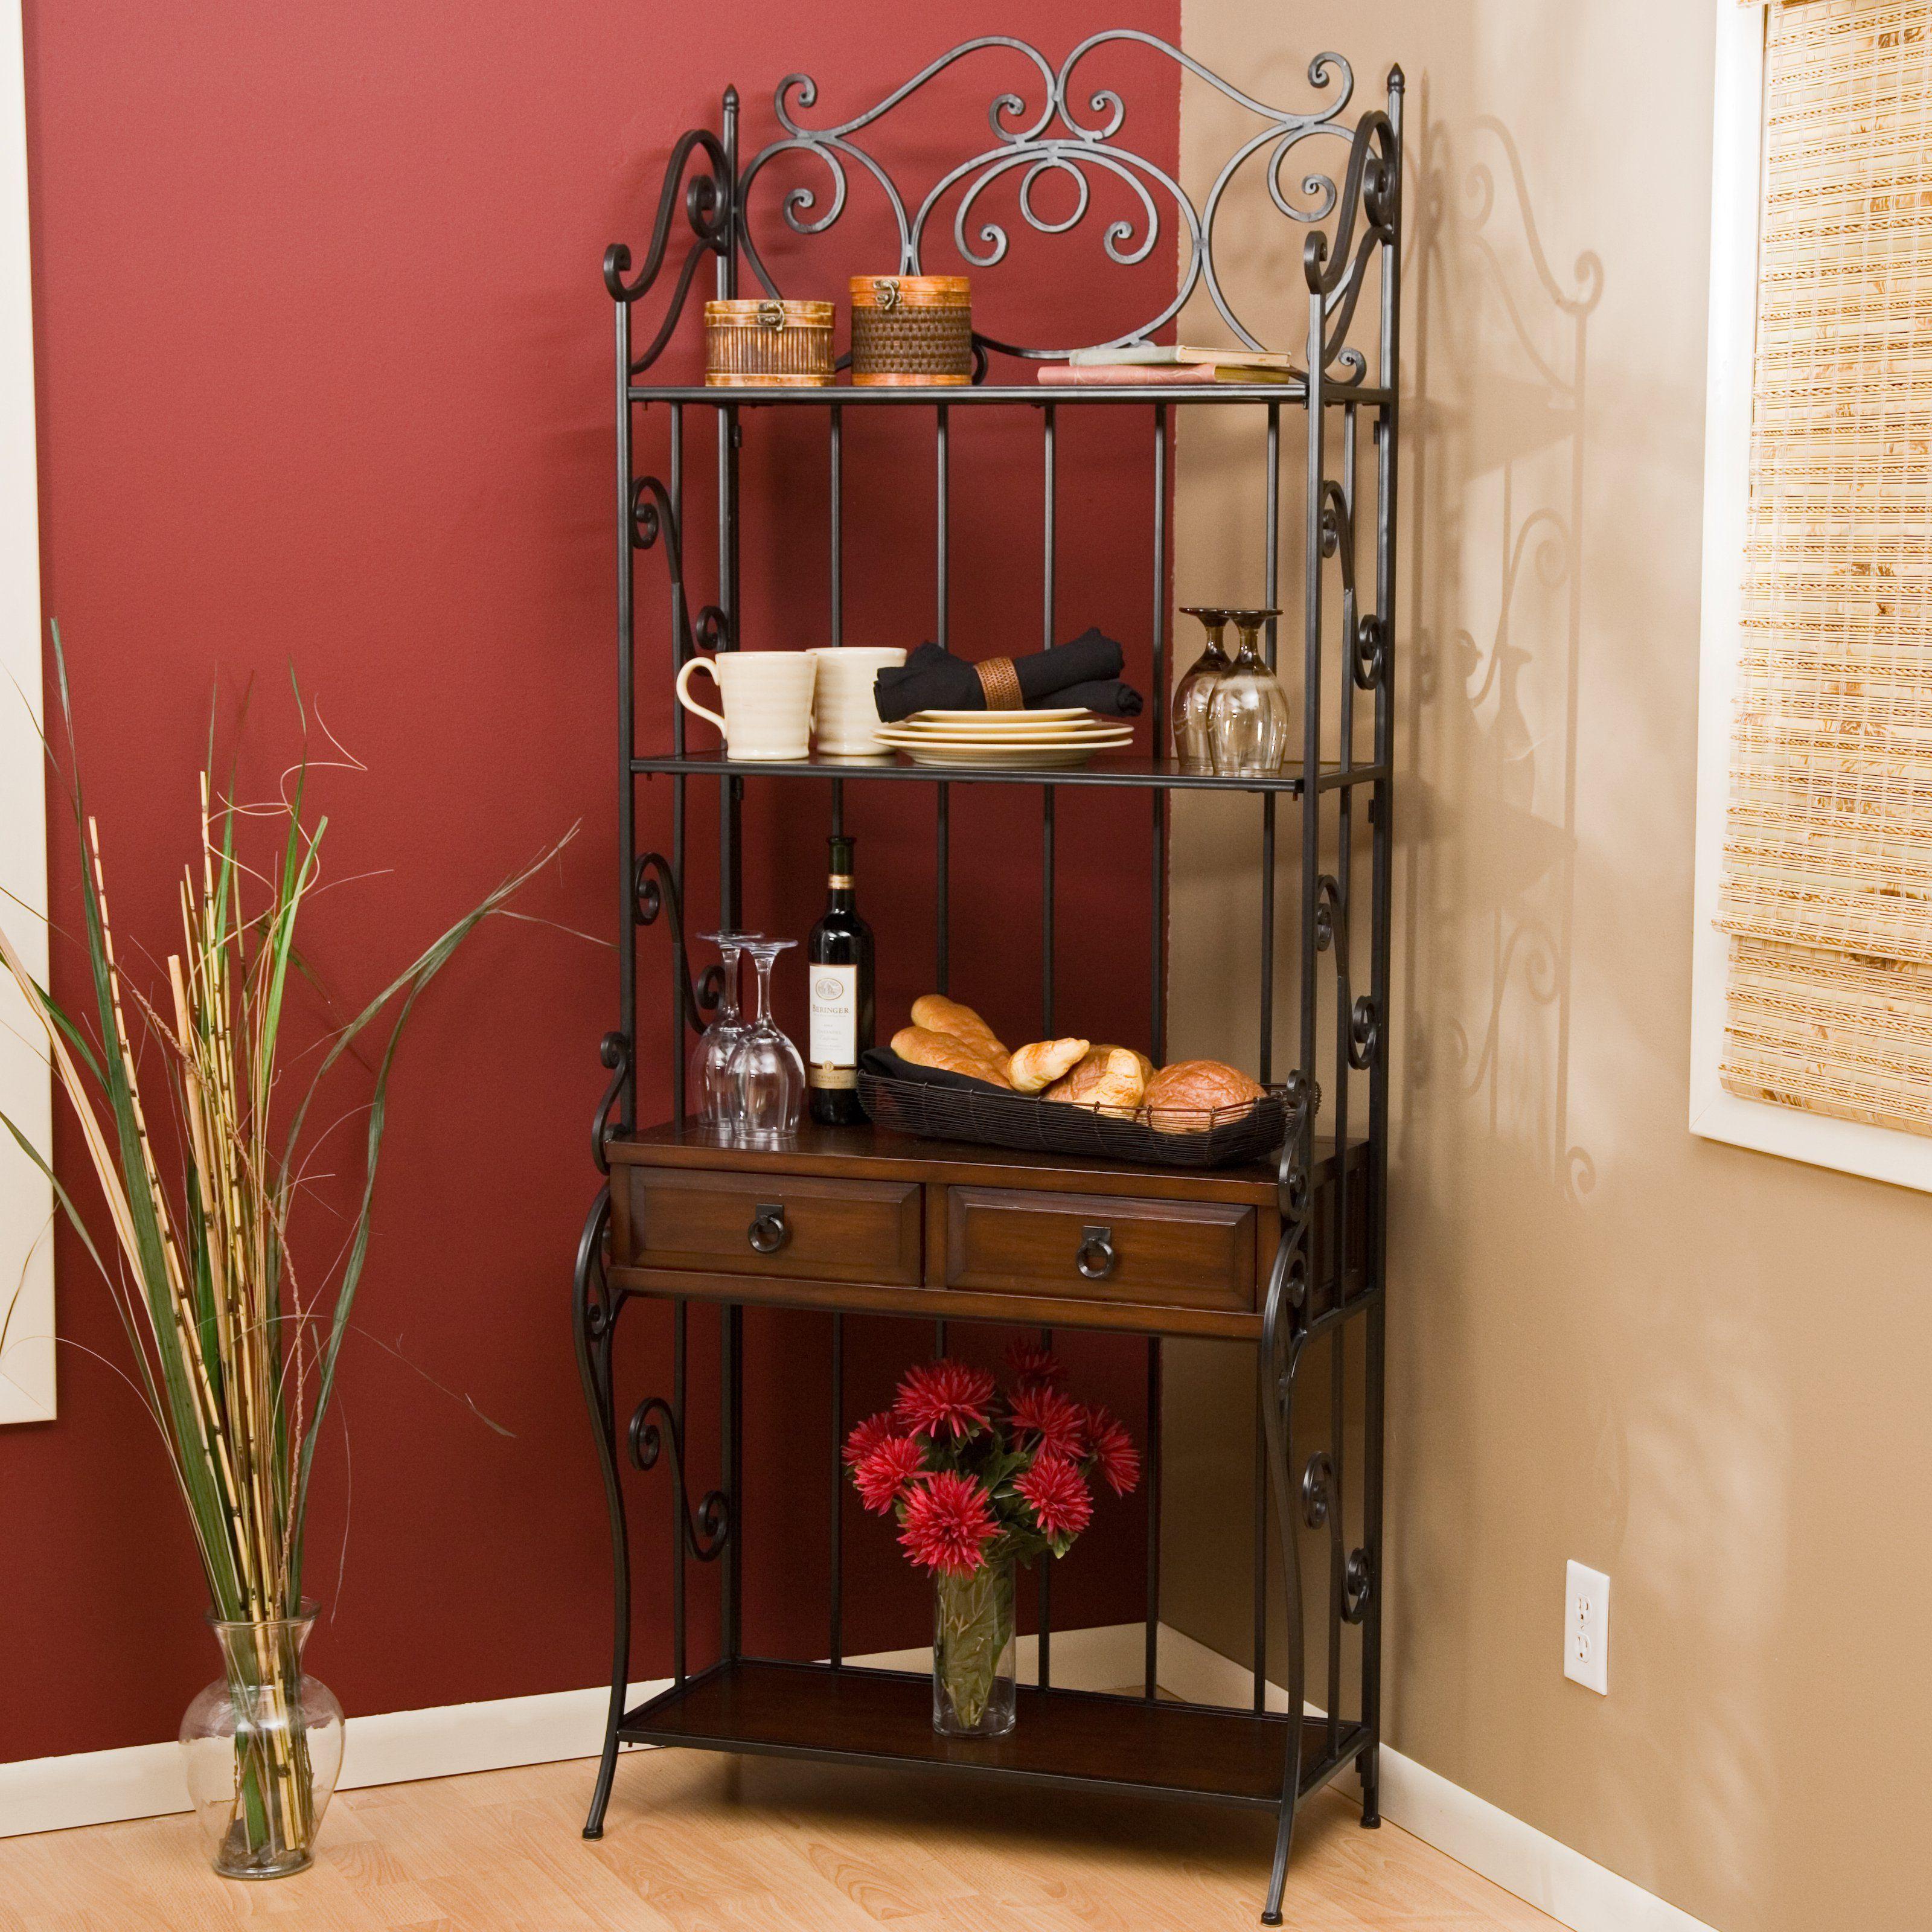 kitchen bakers useful home rilane elegant rack design furniture ideas